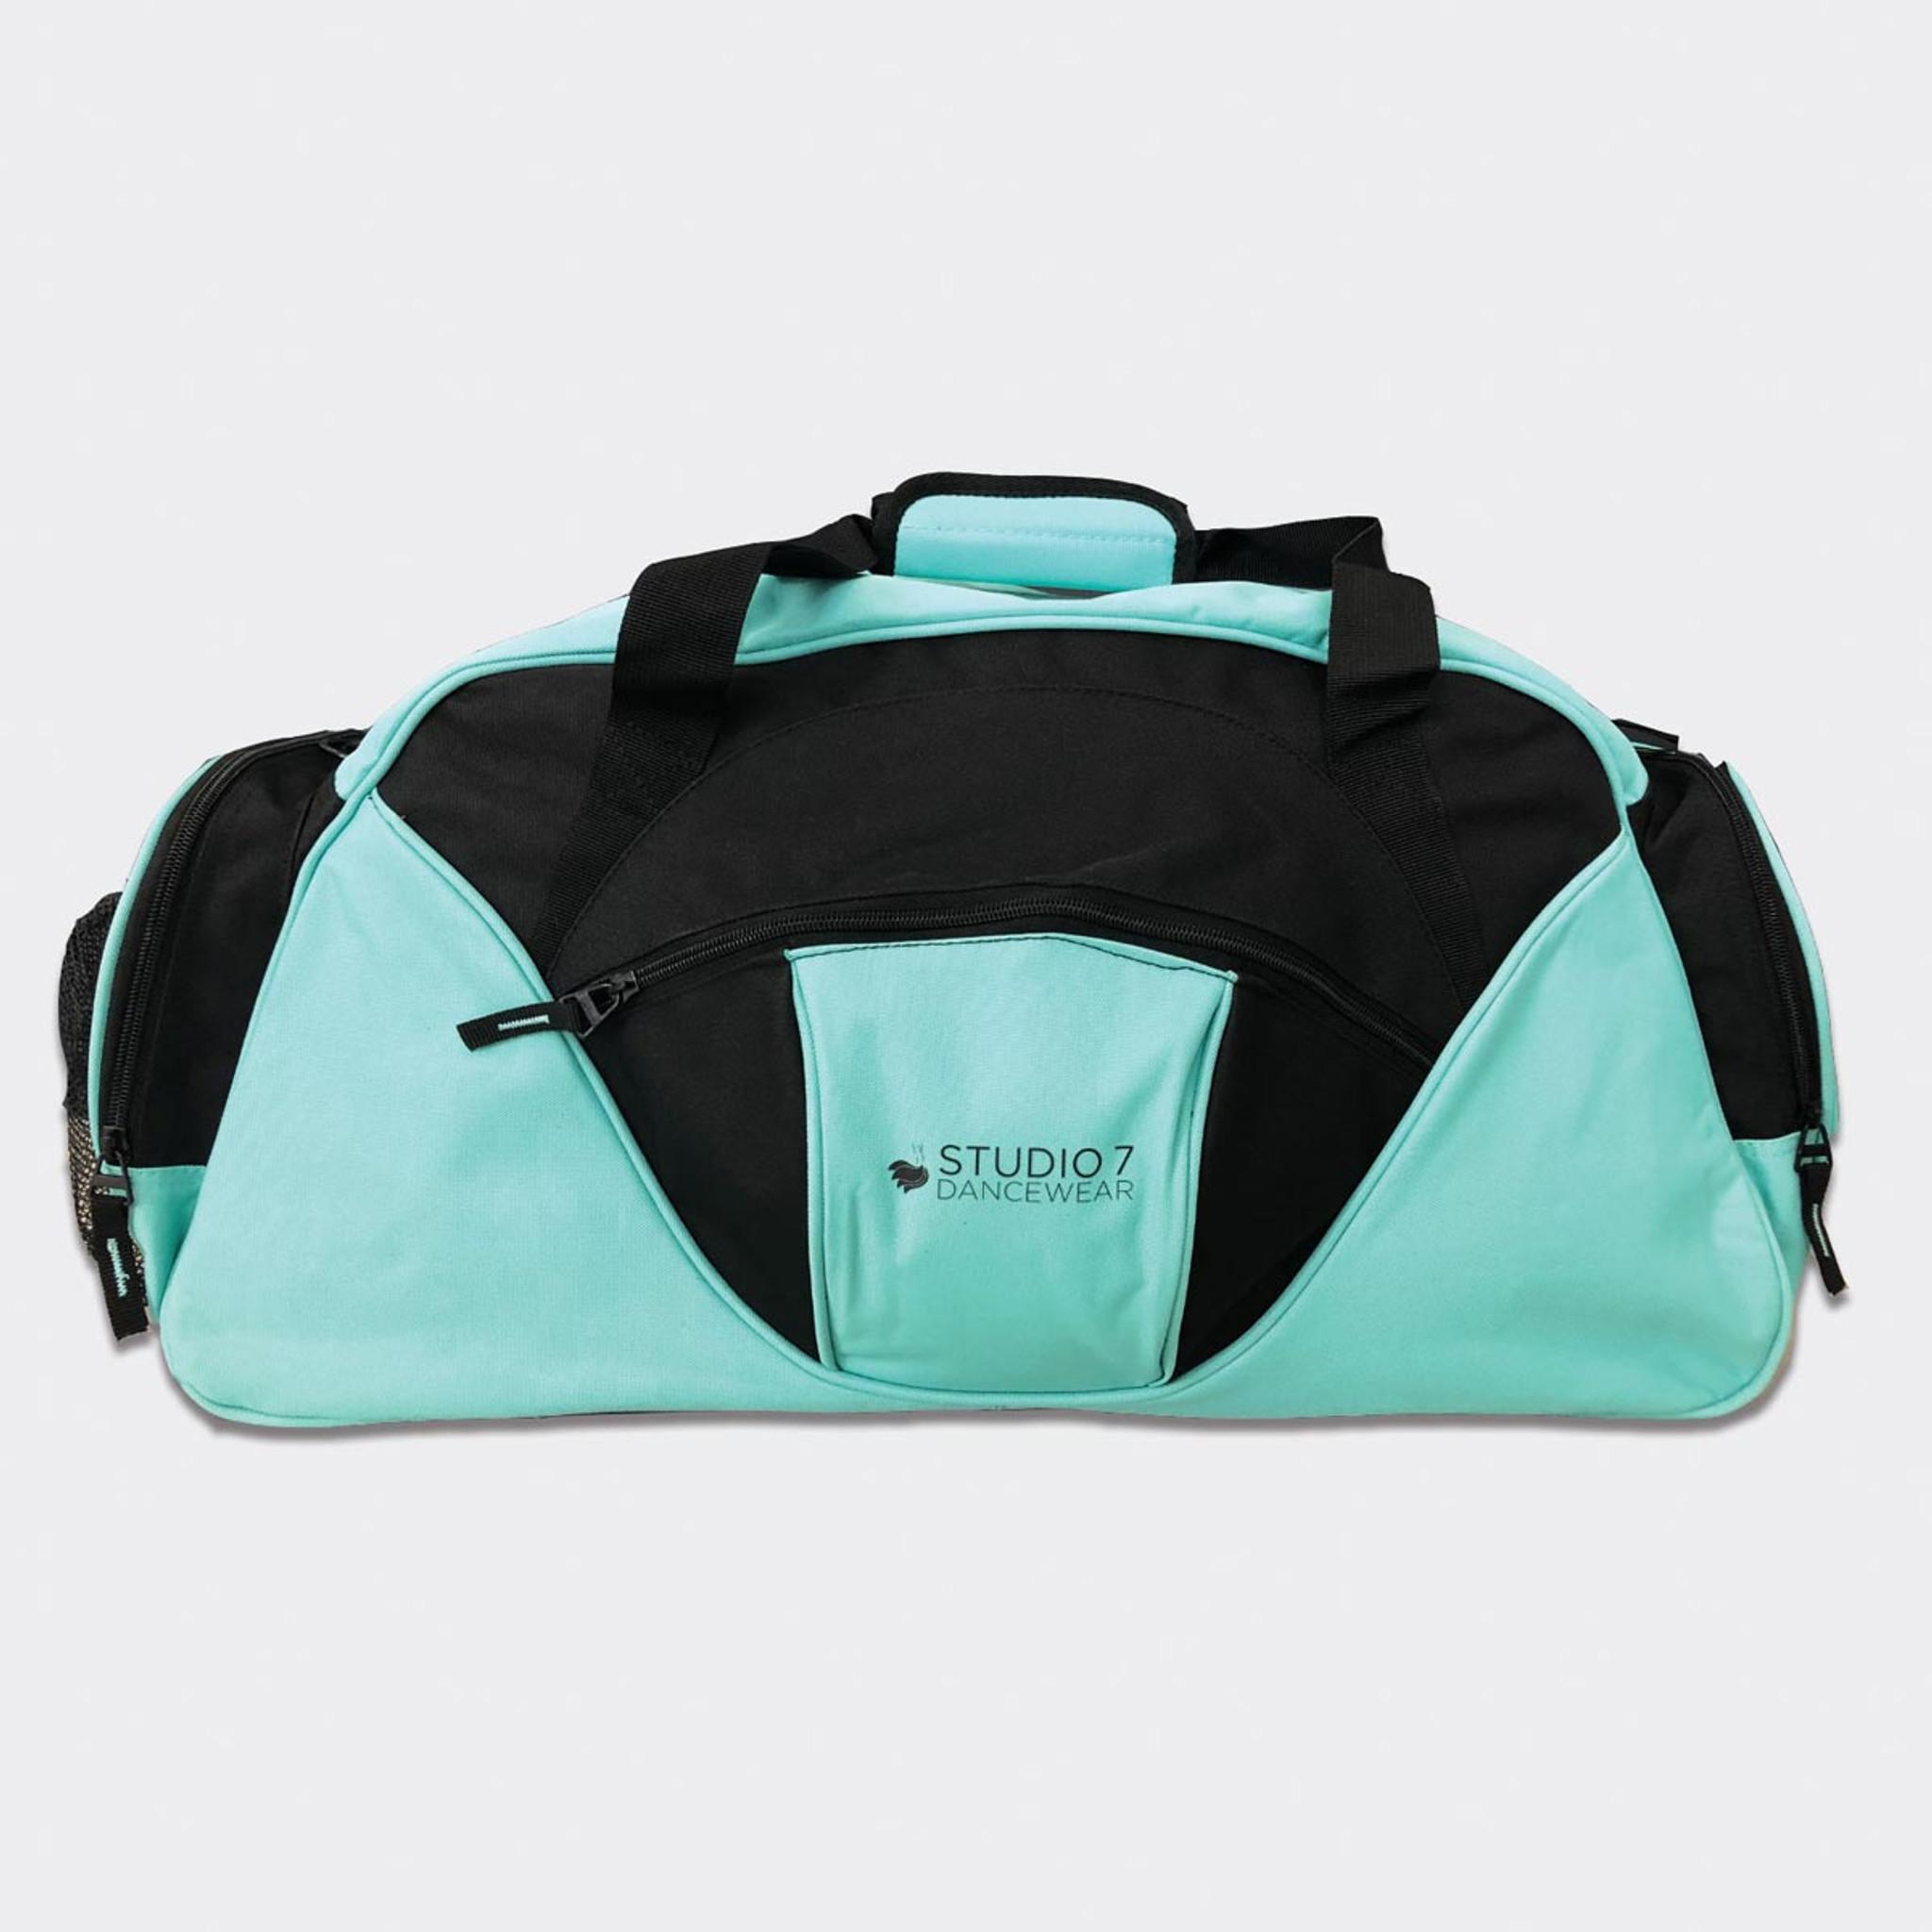 Studio 7 Dancewear Duffel Senior Bag Turquoise